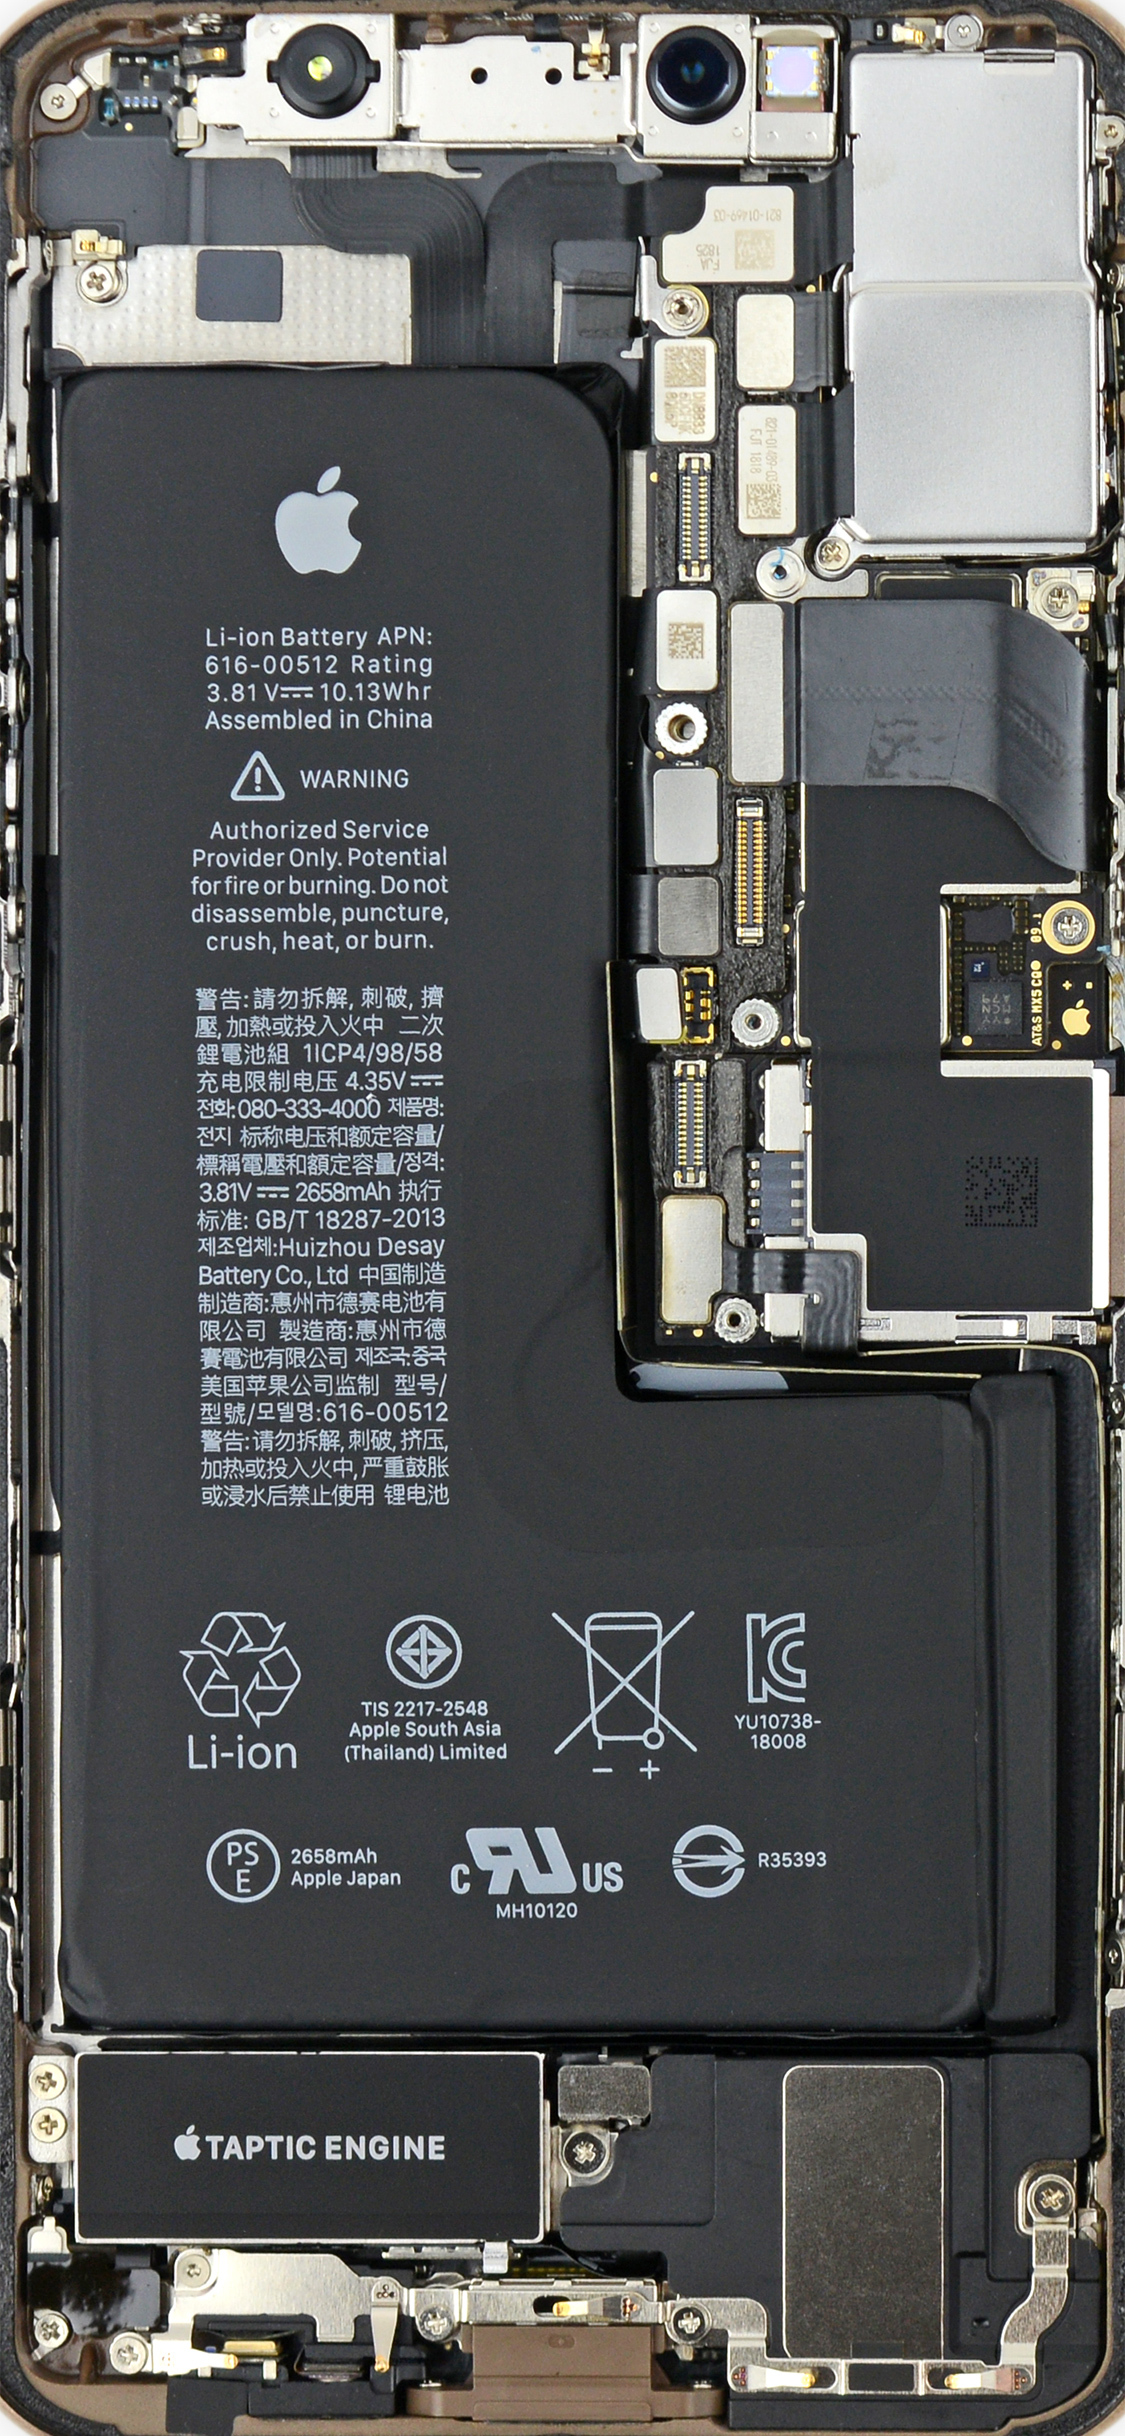 Ifixit Iphone X Internal Wallpaper Iphone Xs Teardown Wallpapers Ifixit